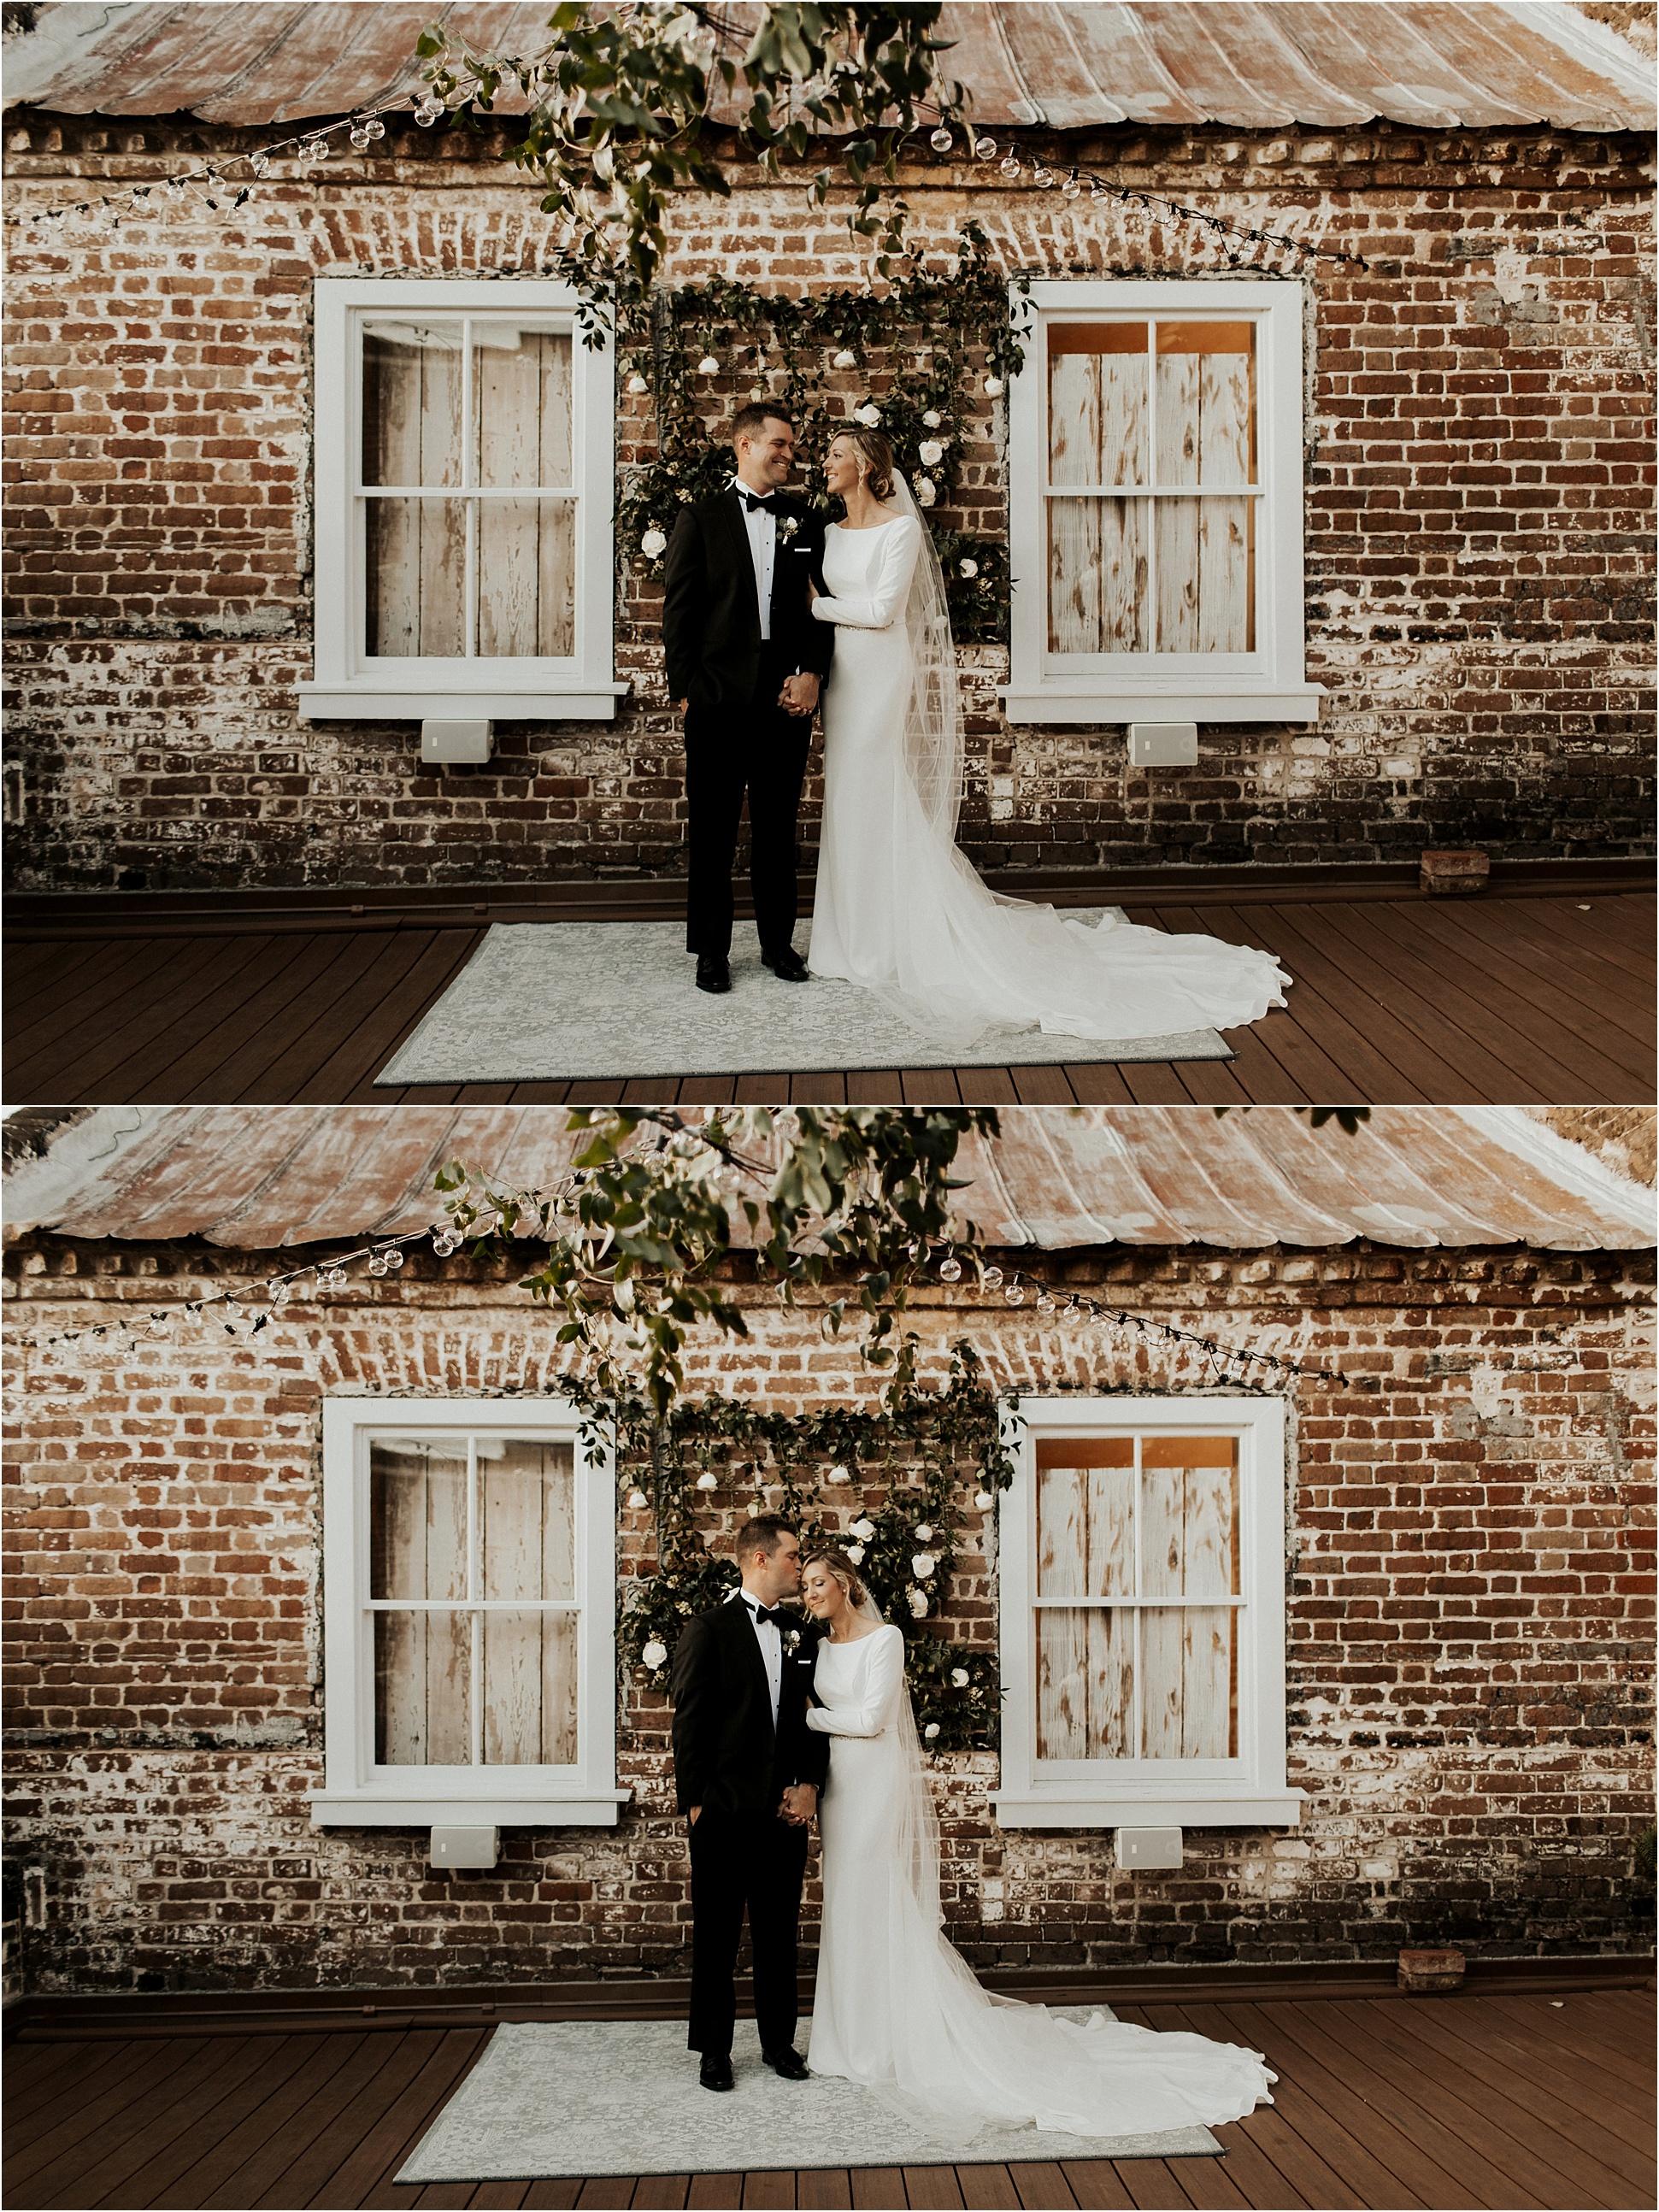 upstairs_midtown_intimate_charleston_wedding053.JPG